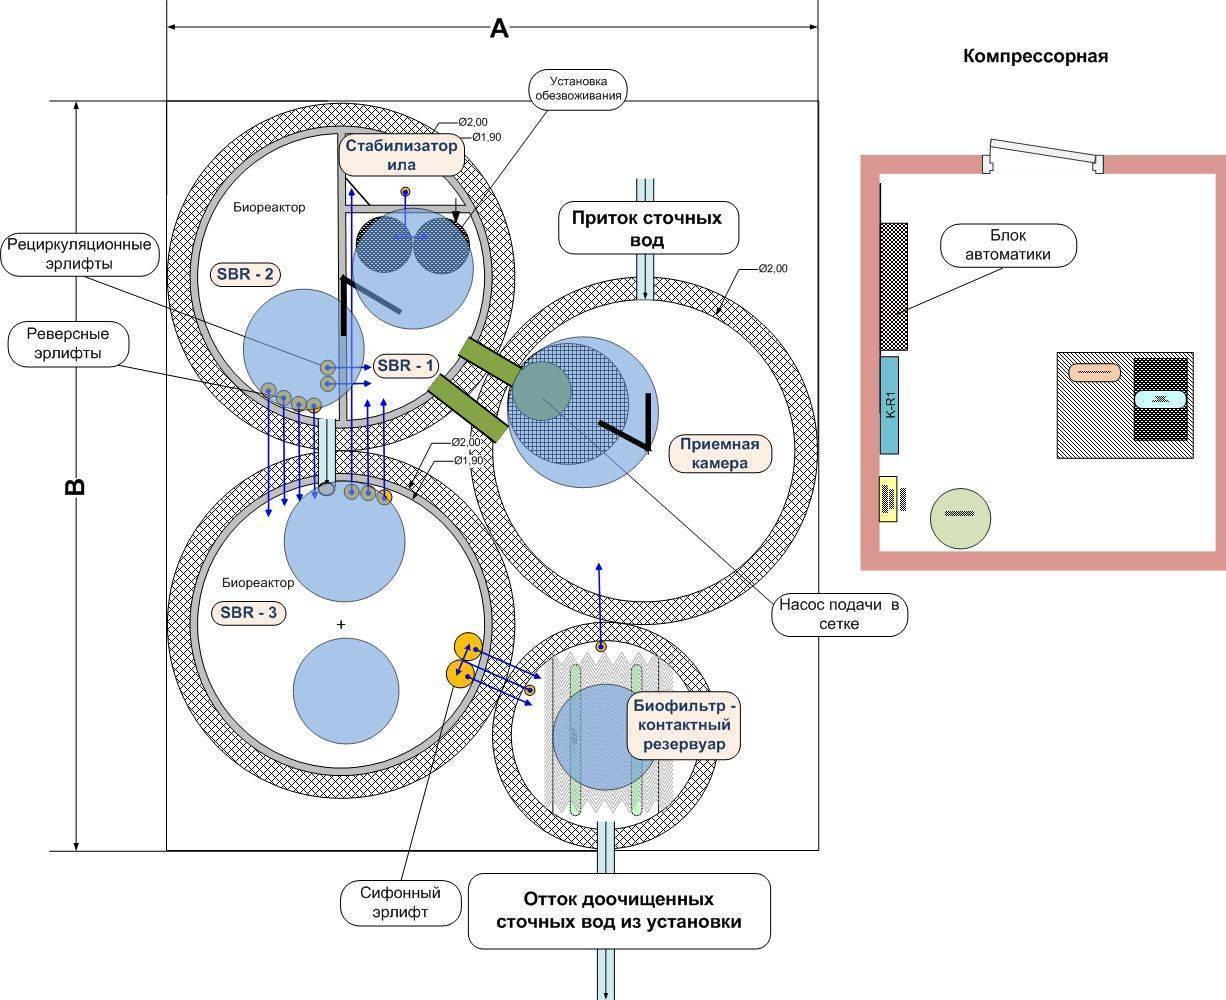 Монтаж системы biotal по установленному регламенту | монтаж biotal